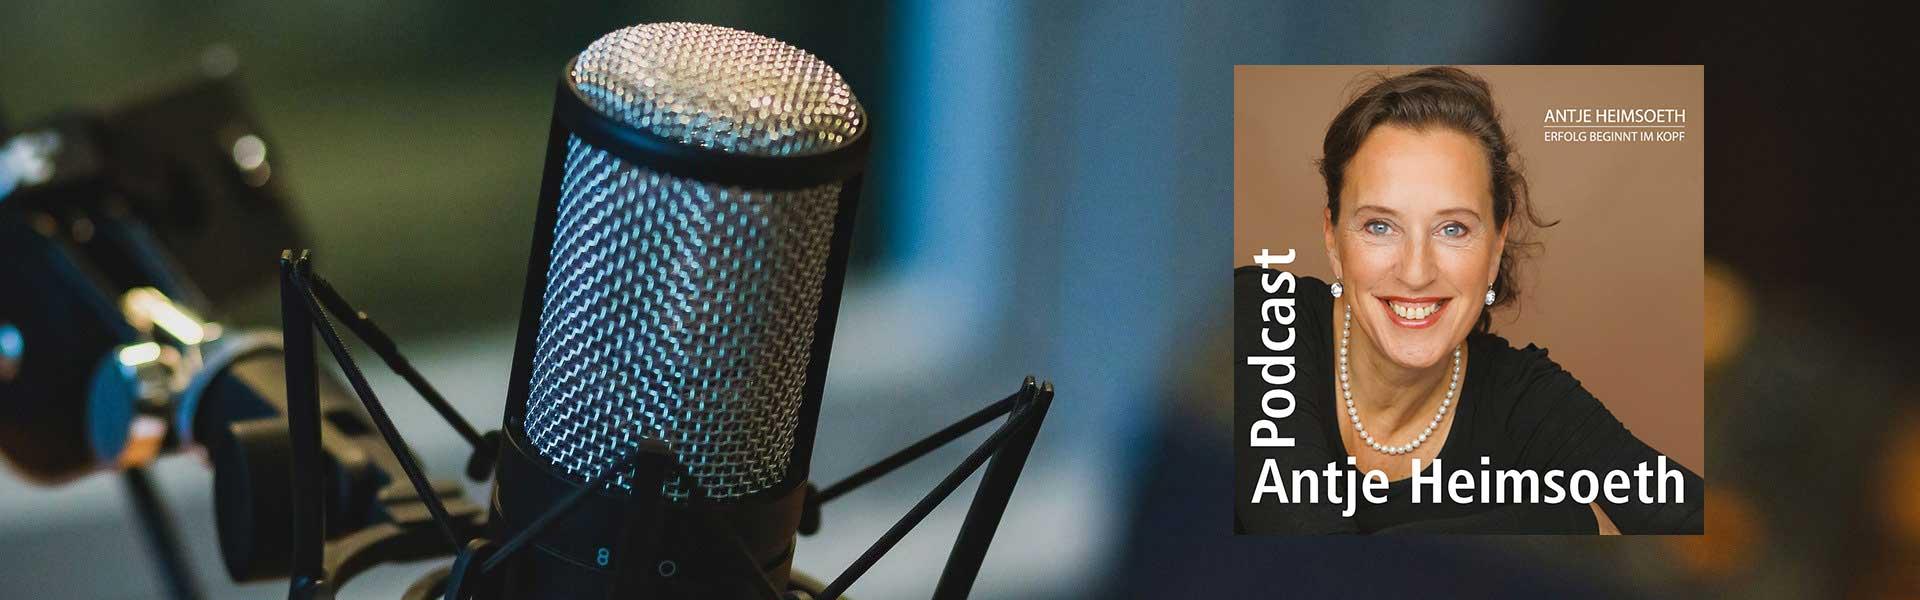 Podcast Antje Heimsoeth